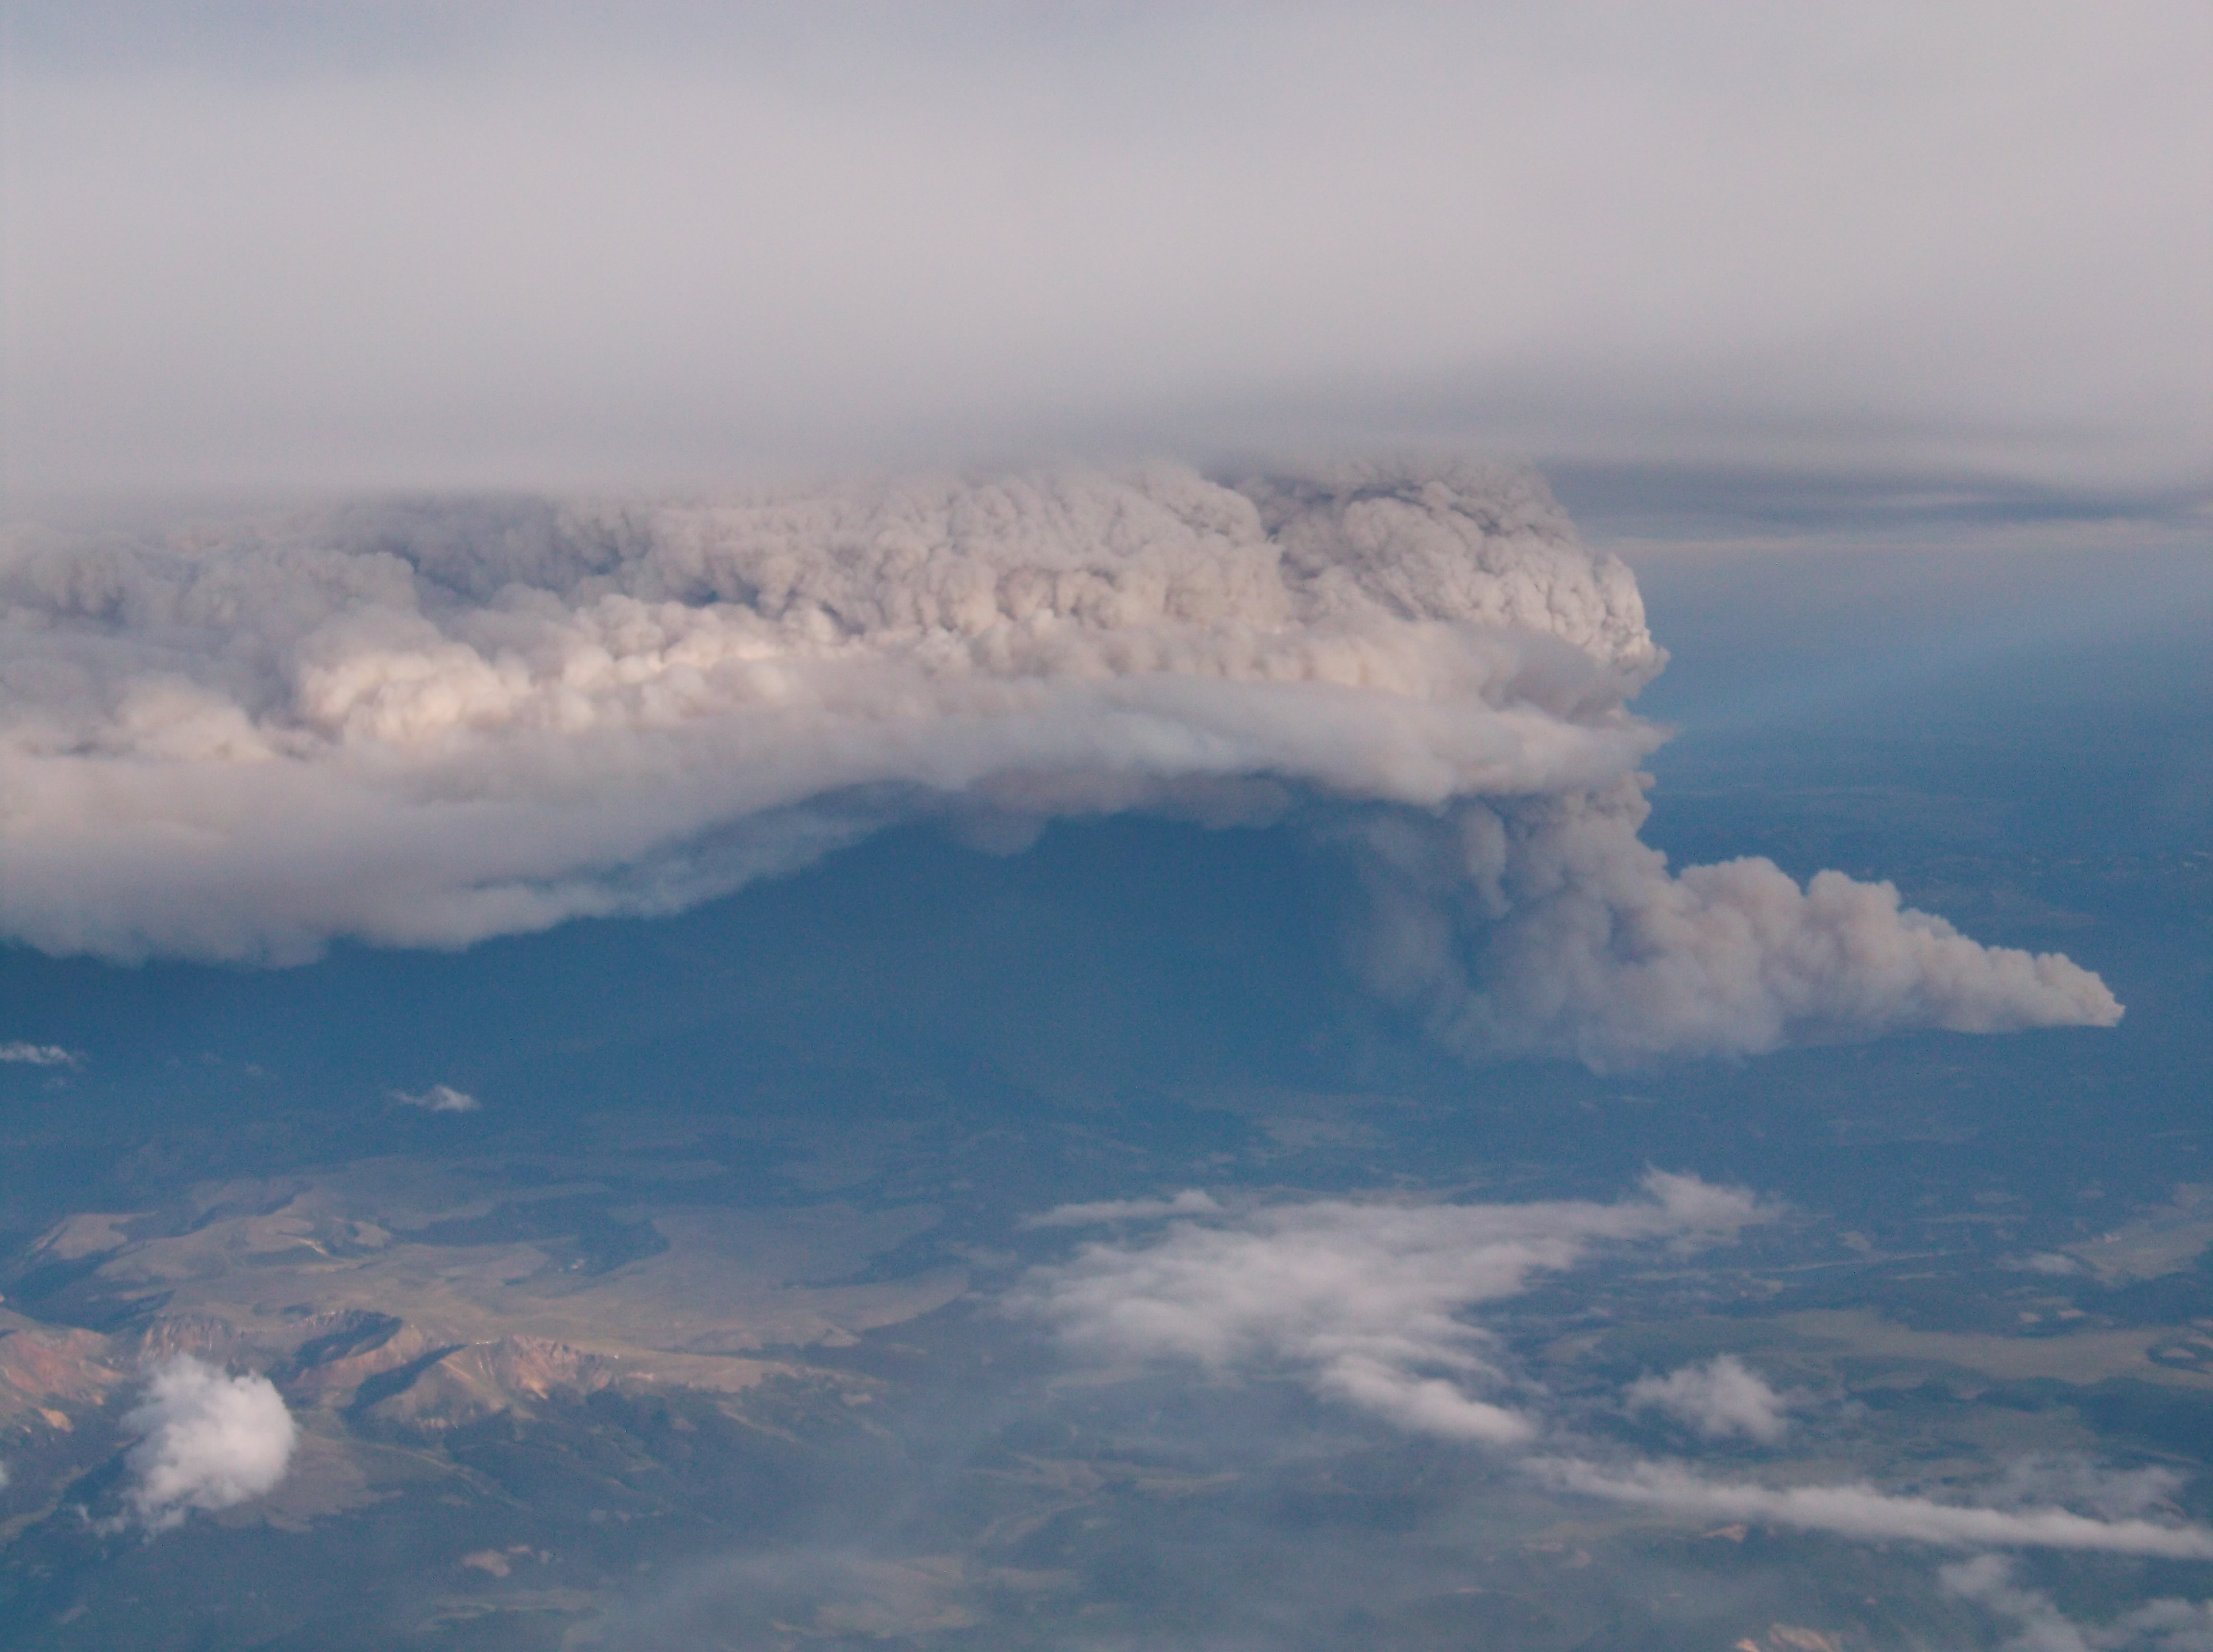 130621_west_fork_fire_aerial_view_04.jpg